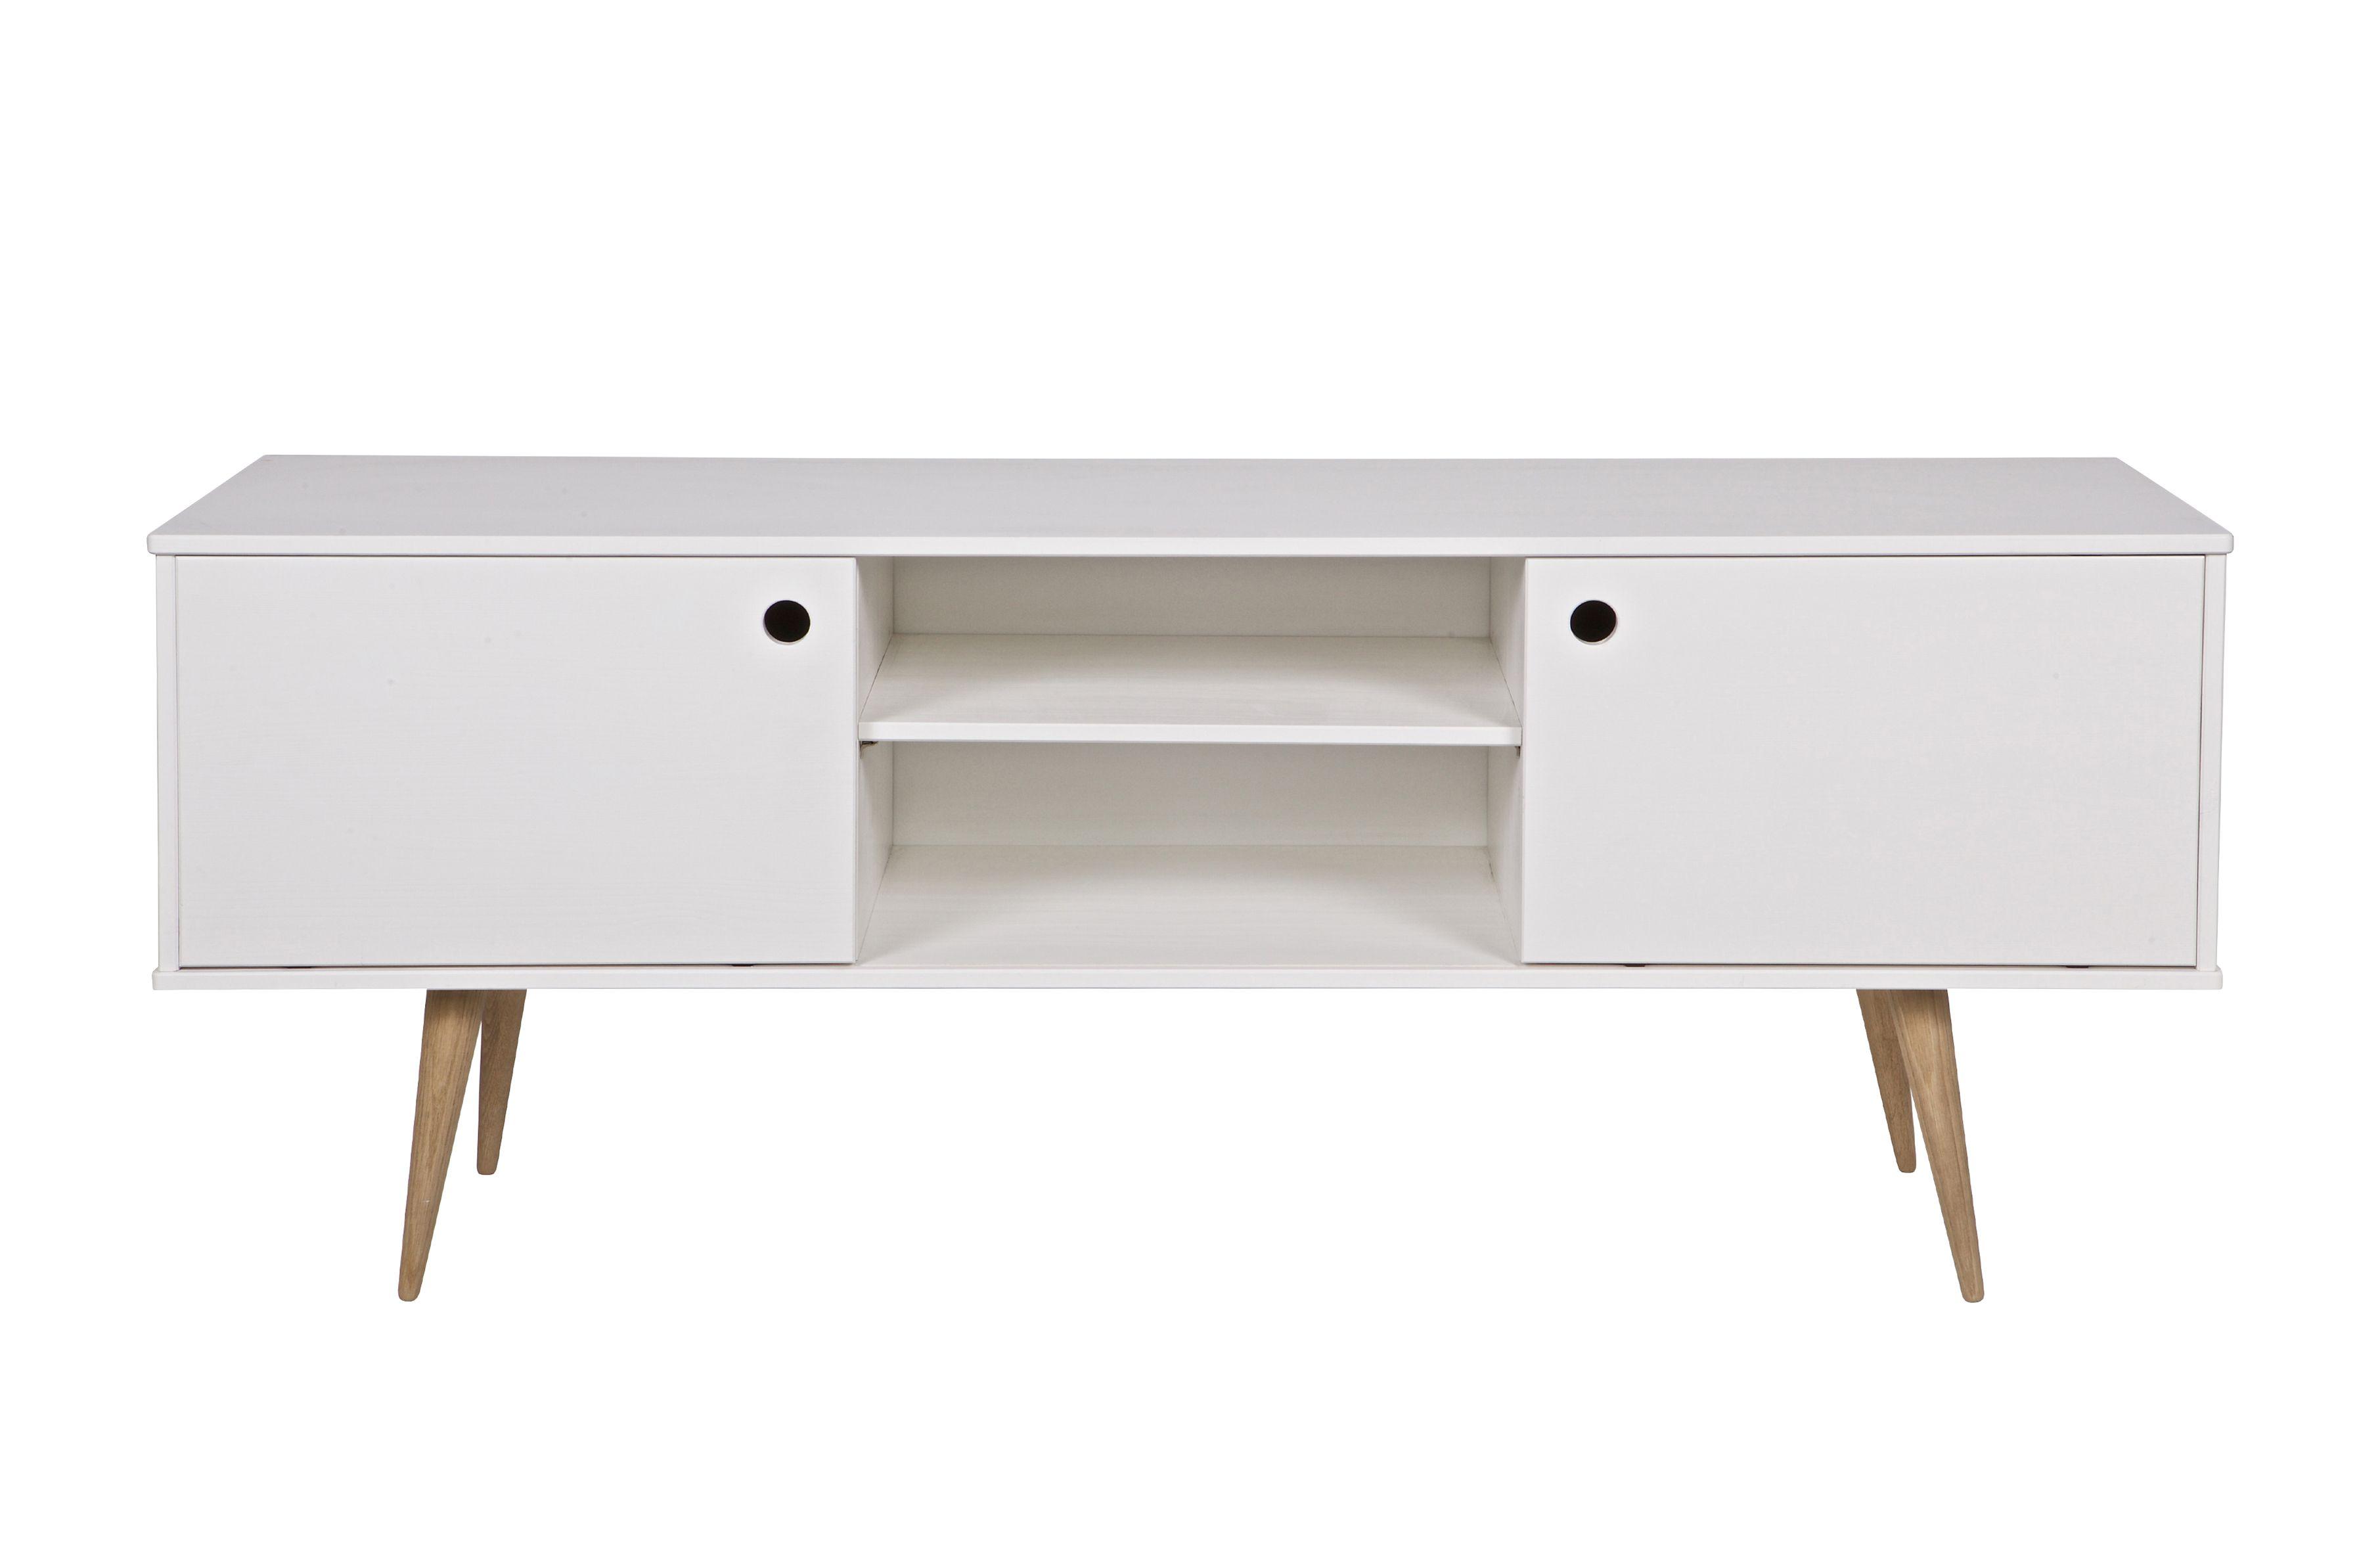 retro tv m bel weib tv medienm bel wohnzimmer de eekhoorn m bel accessoires. Black Bedroom Furniture Sets. Home Design Ideas